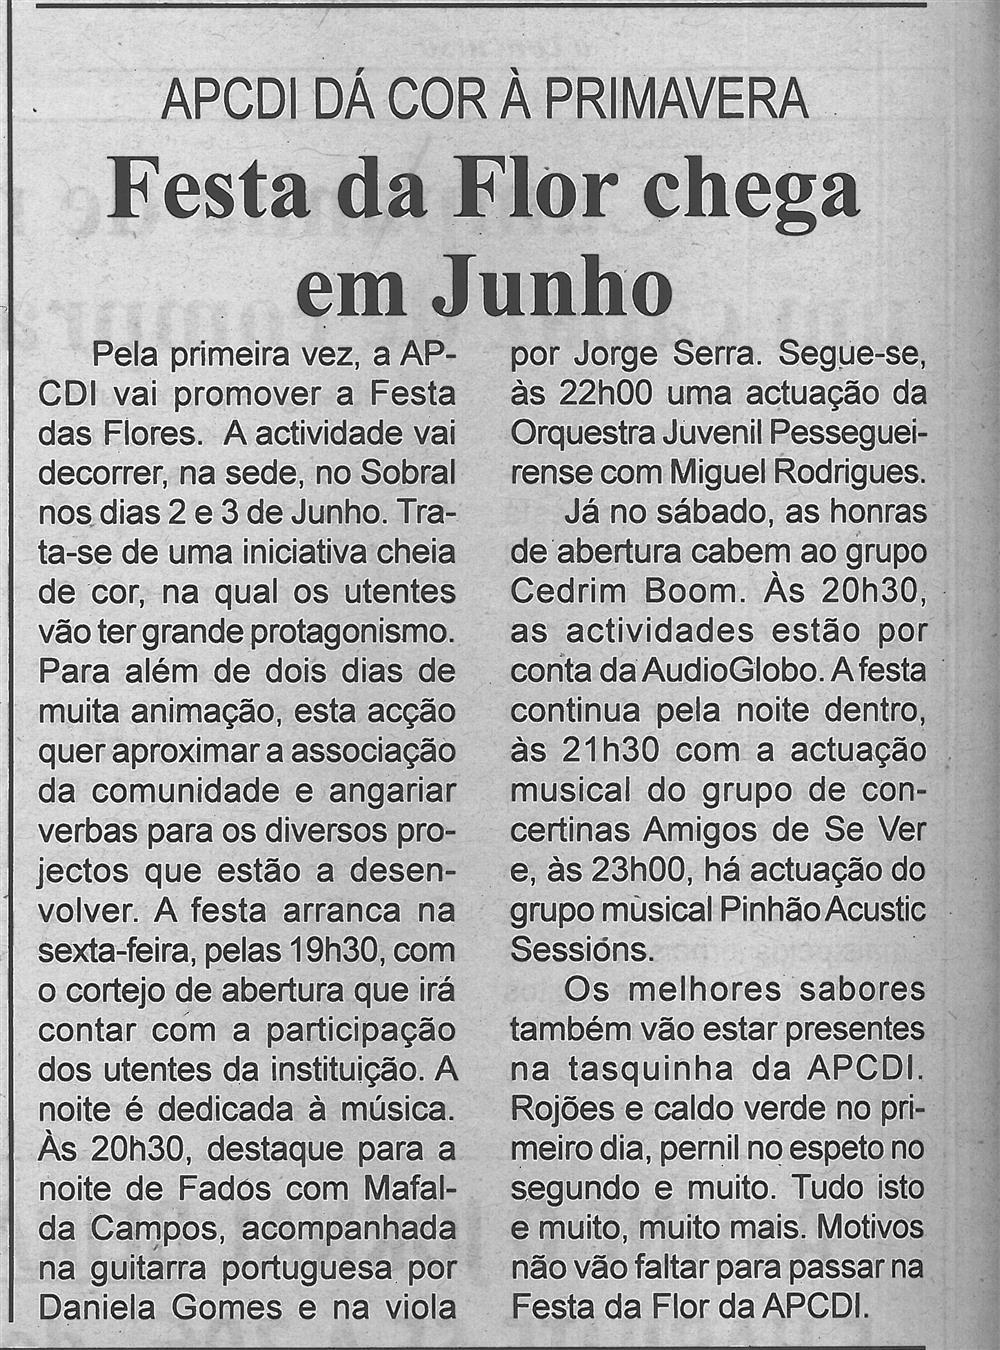 BV-1.ªjun.'17-p.4-Festa da Flor chega em junho : APCDI dá cor à Primavera.jpg